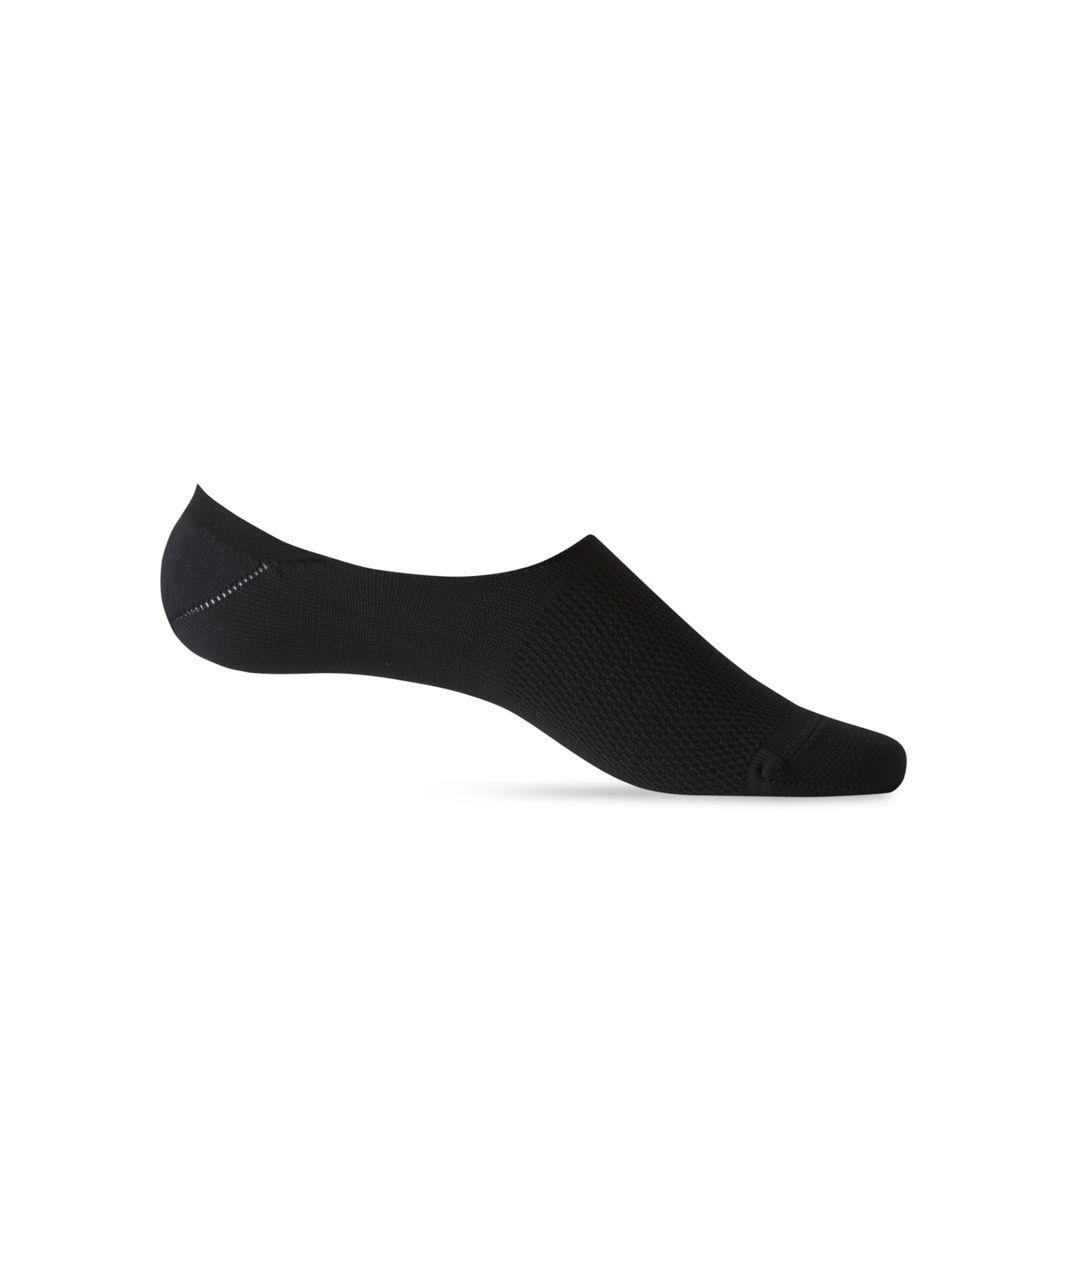 Lululemon Secret Sock - Black (First Release)